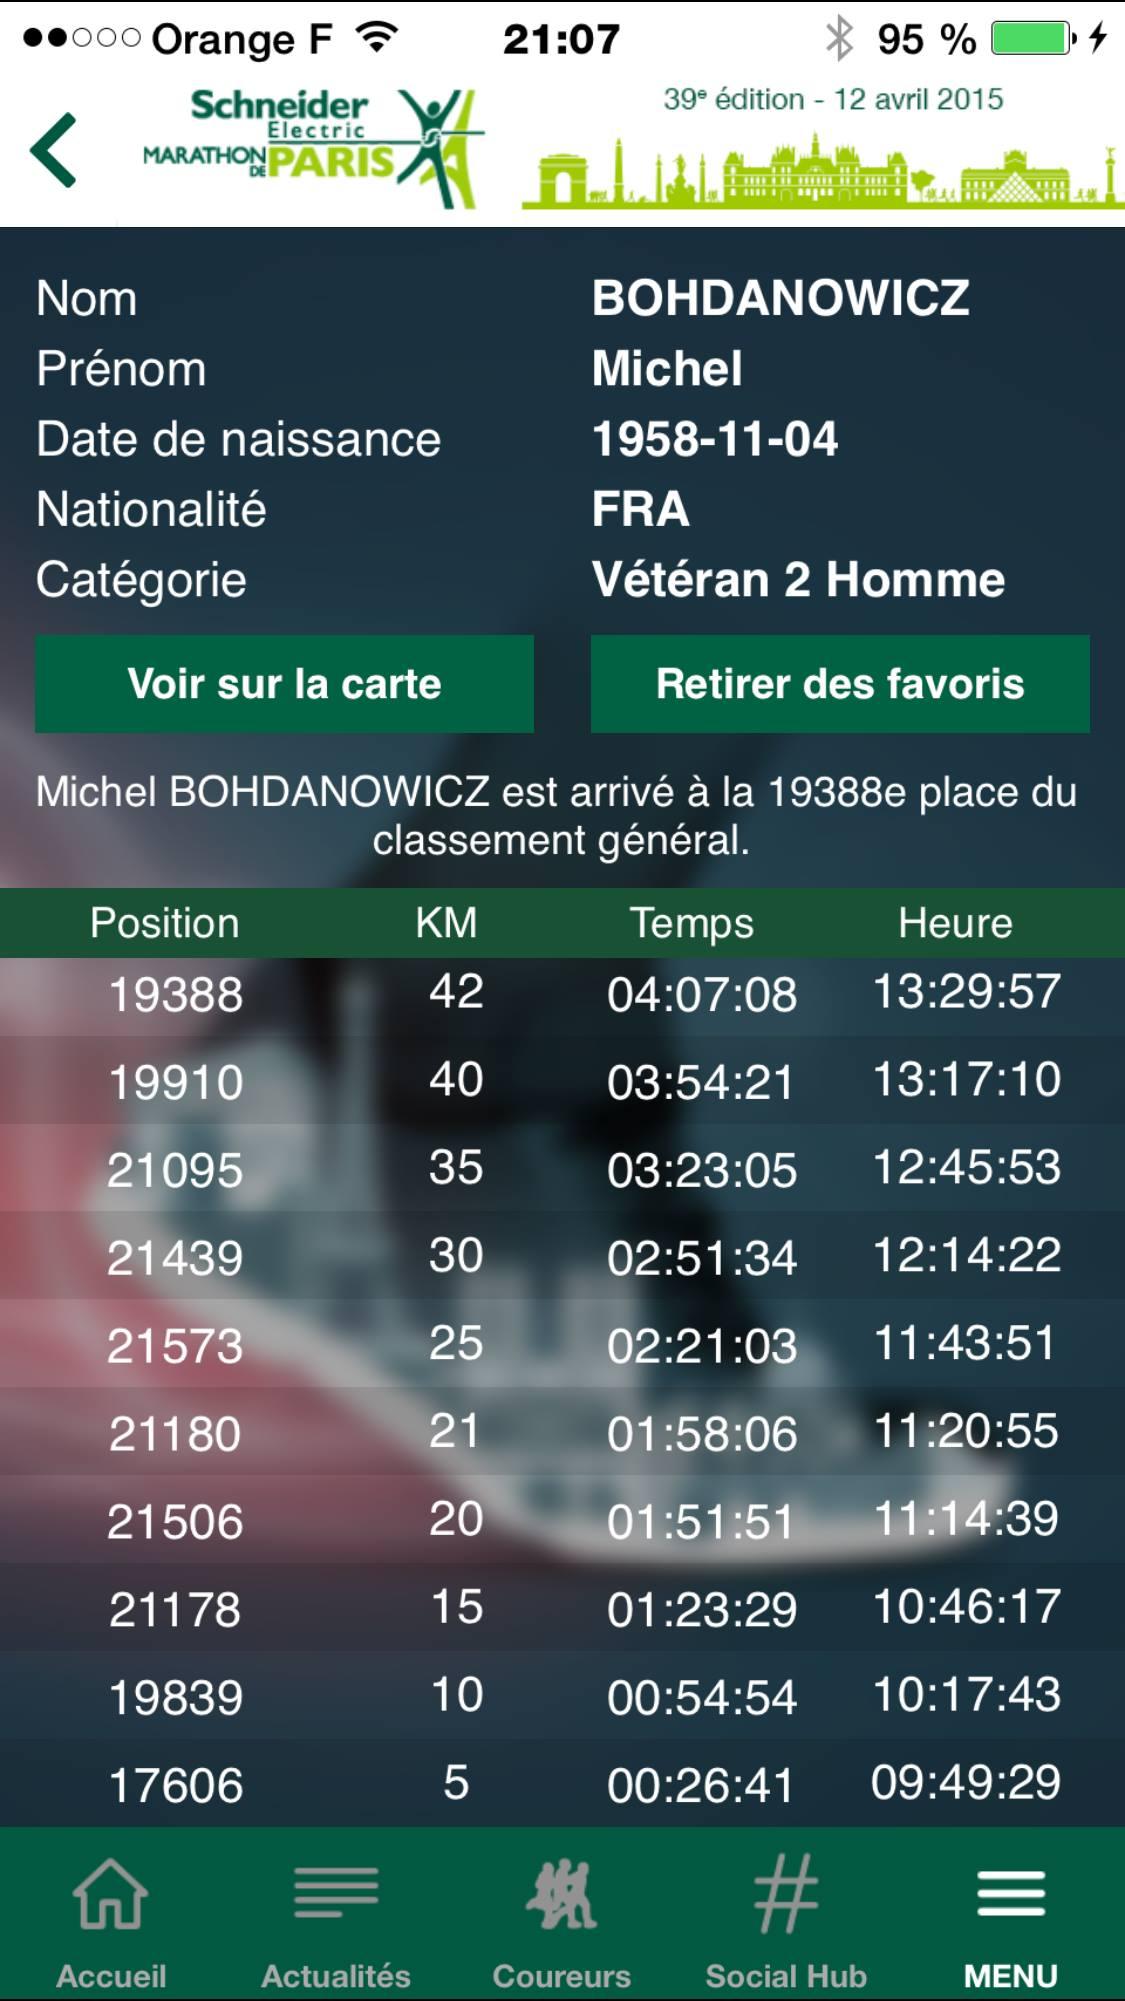 Resultat marathon paris 2015 blog expert comptable - Classement cabinet expertise comptable ...